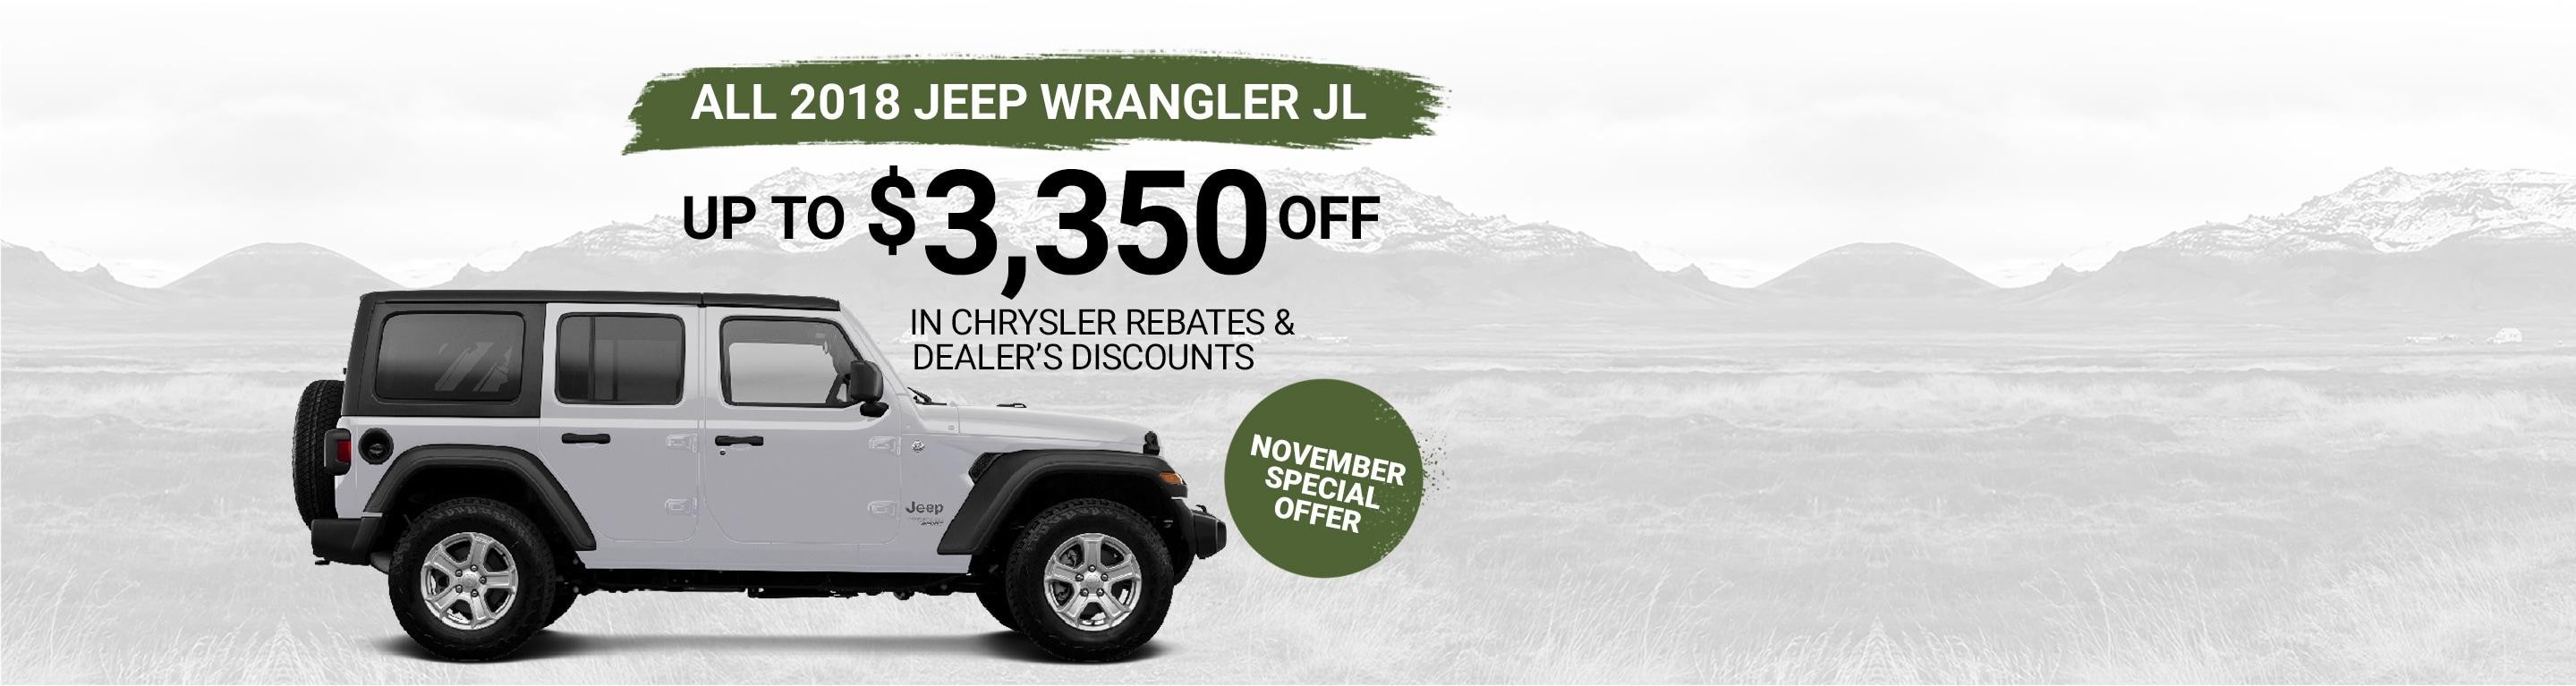 Team Chrysler Jeep Dodge Ram Dealer Mississauga Brampton Toronto Wrangler Parts Book Next